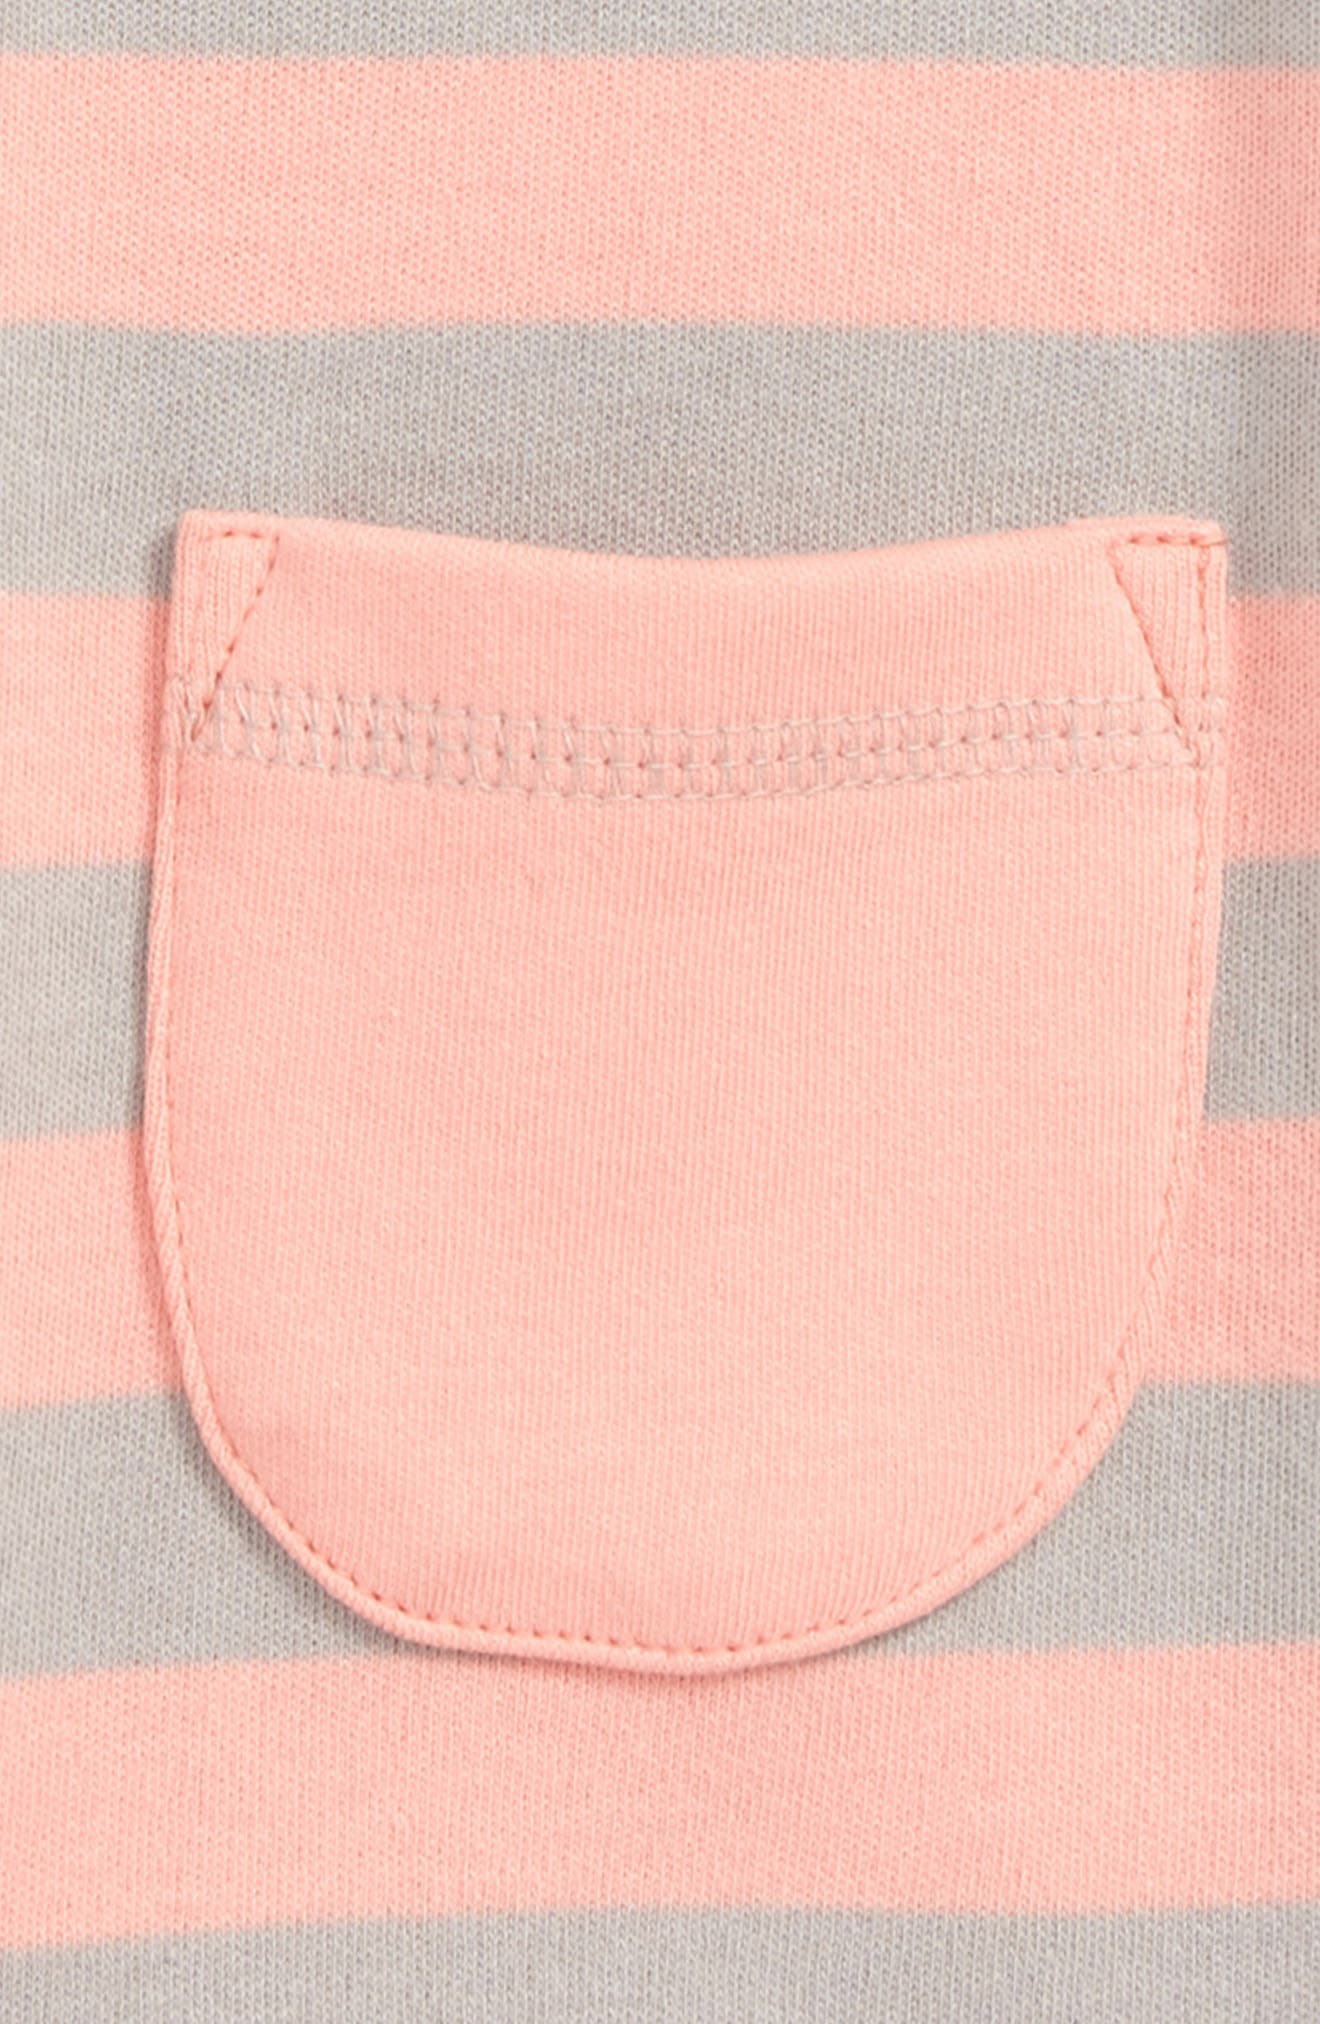 L'OVEDBABY, Organic Cotton Romper, Alternate thumbnail 3, color, CORAL/ LIGHT GRAY STRIPE